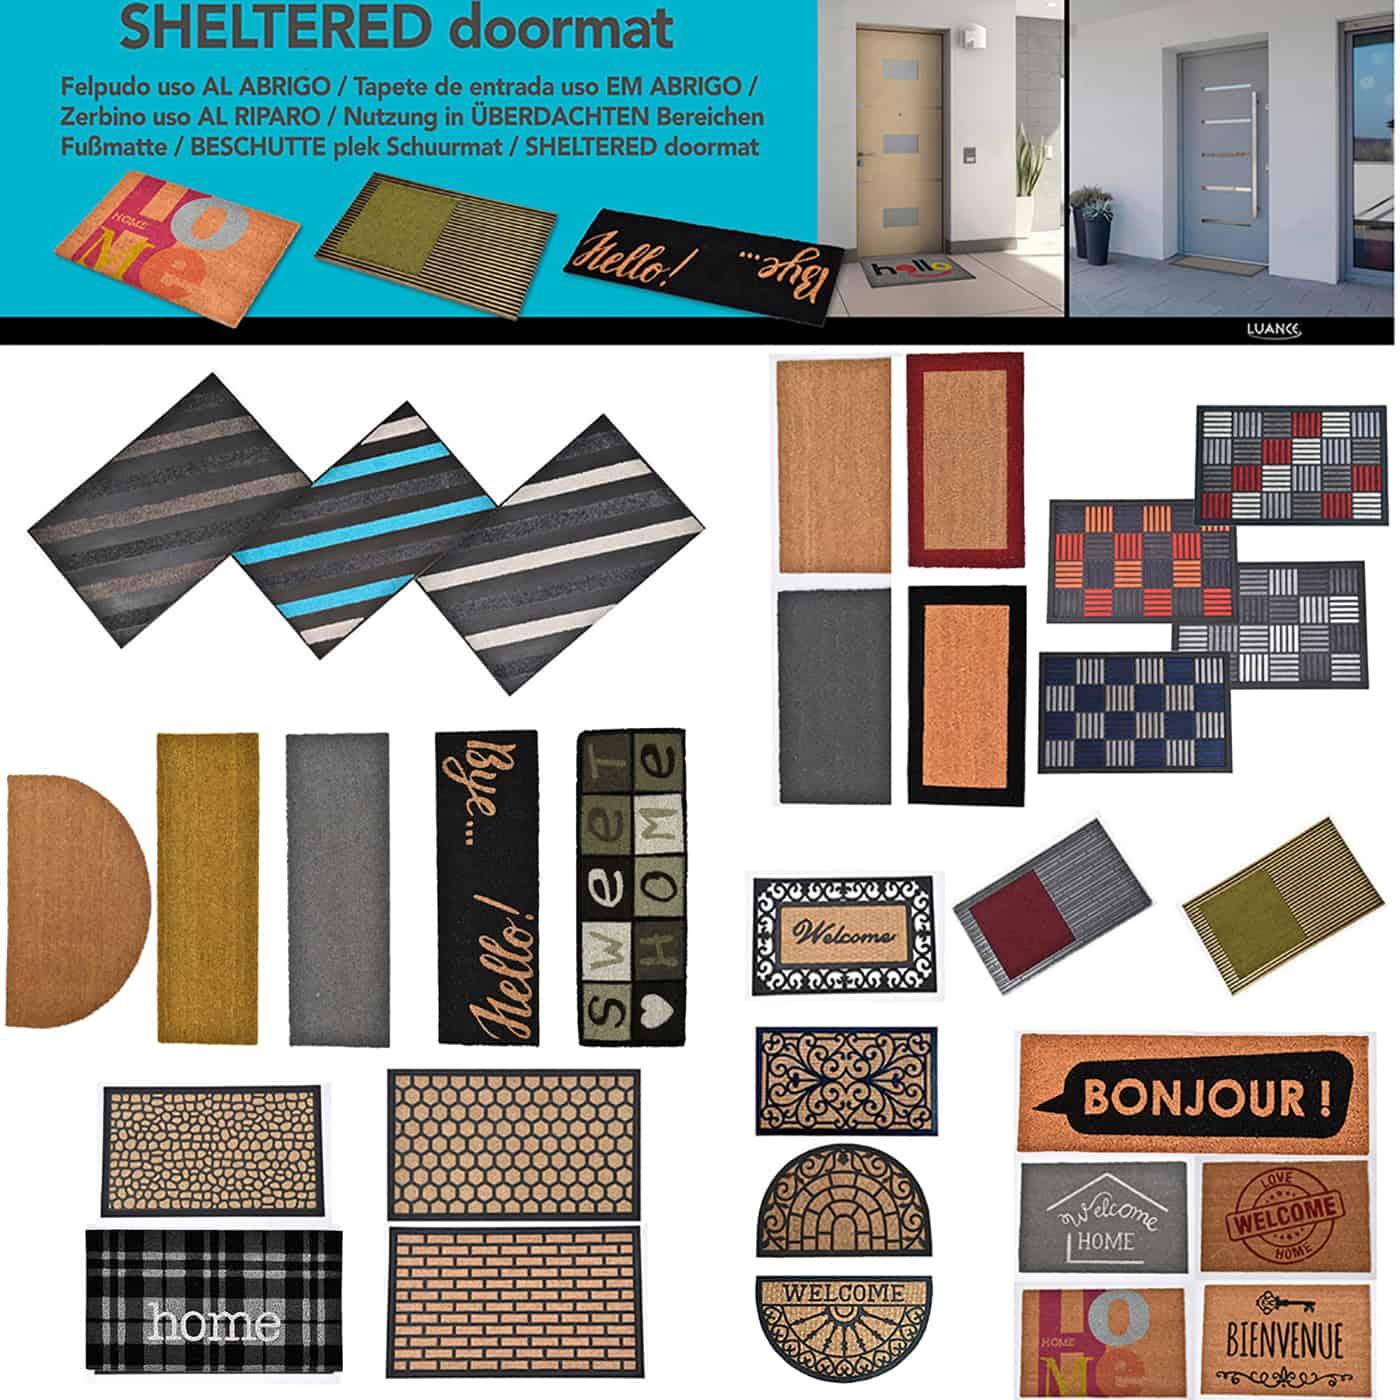 Sheltered Printed Long Front Door Mat Bonjour Coir Coco Fibers Rug 30x10 Black Natural